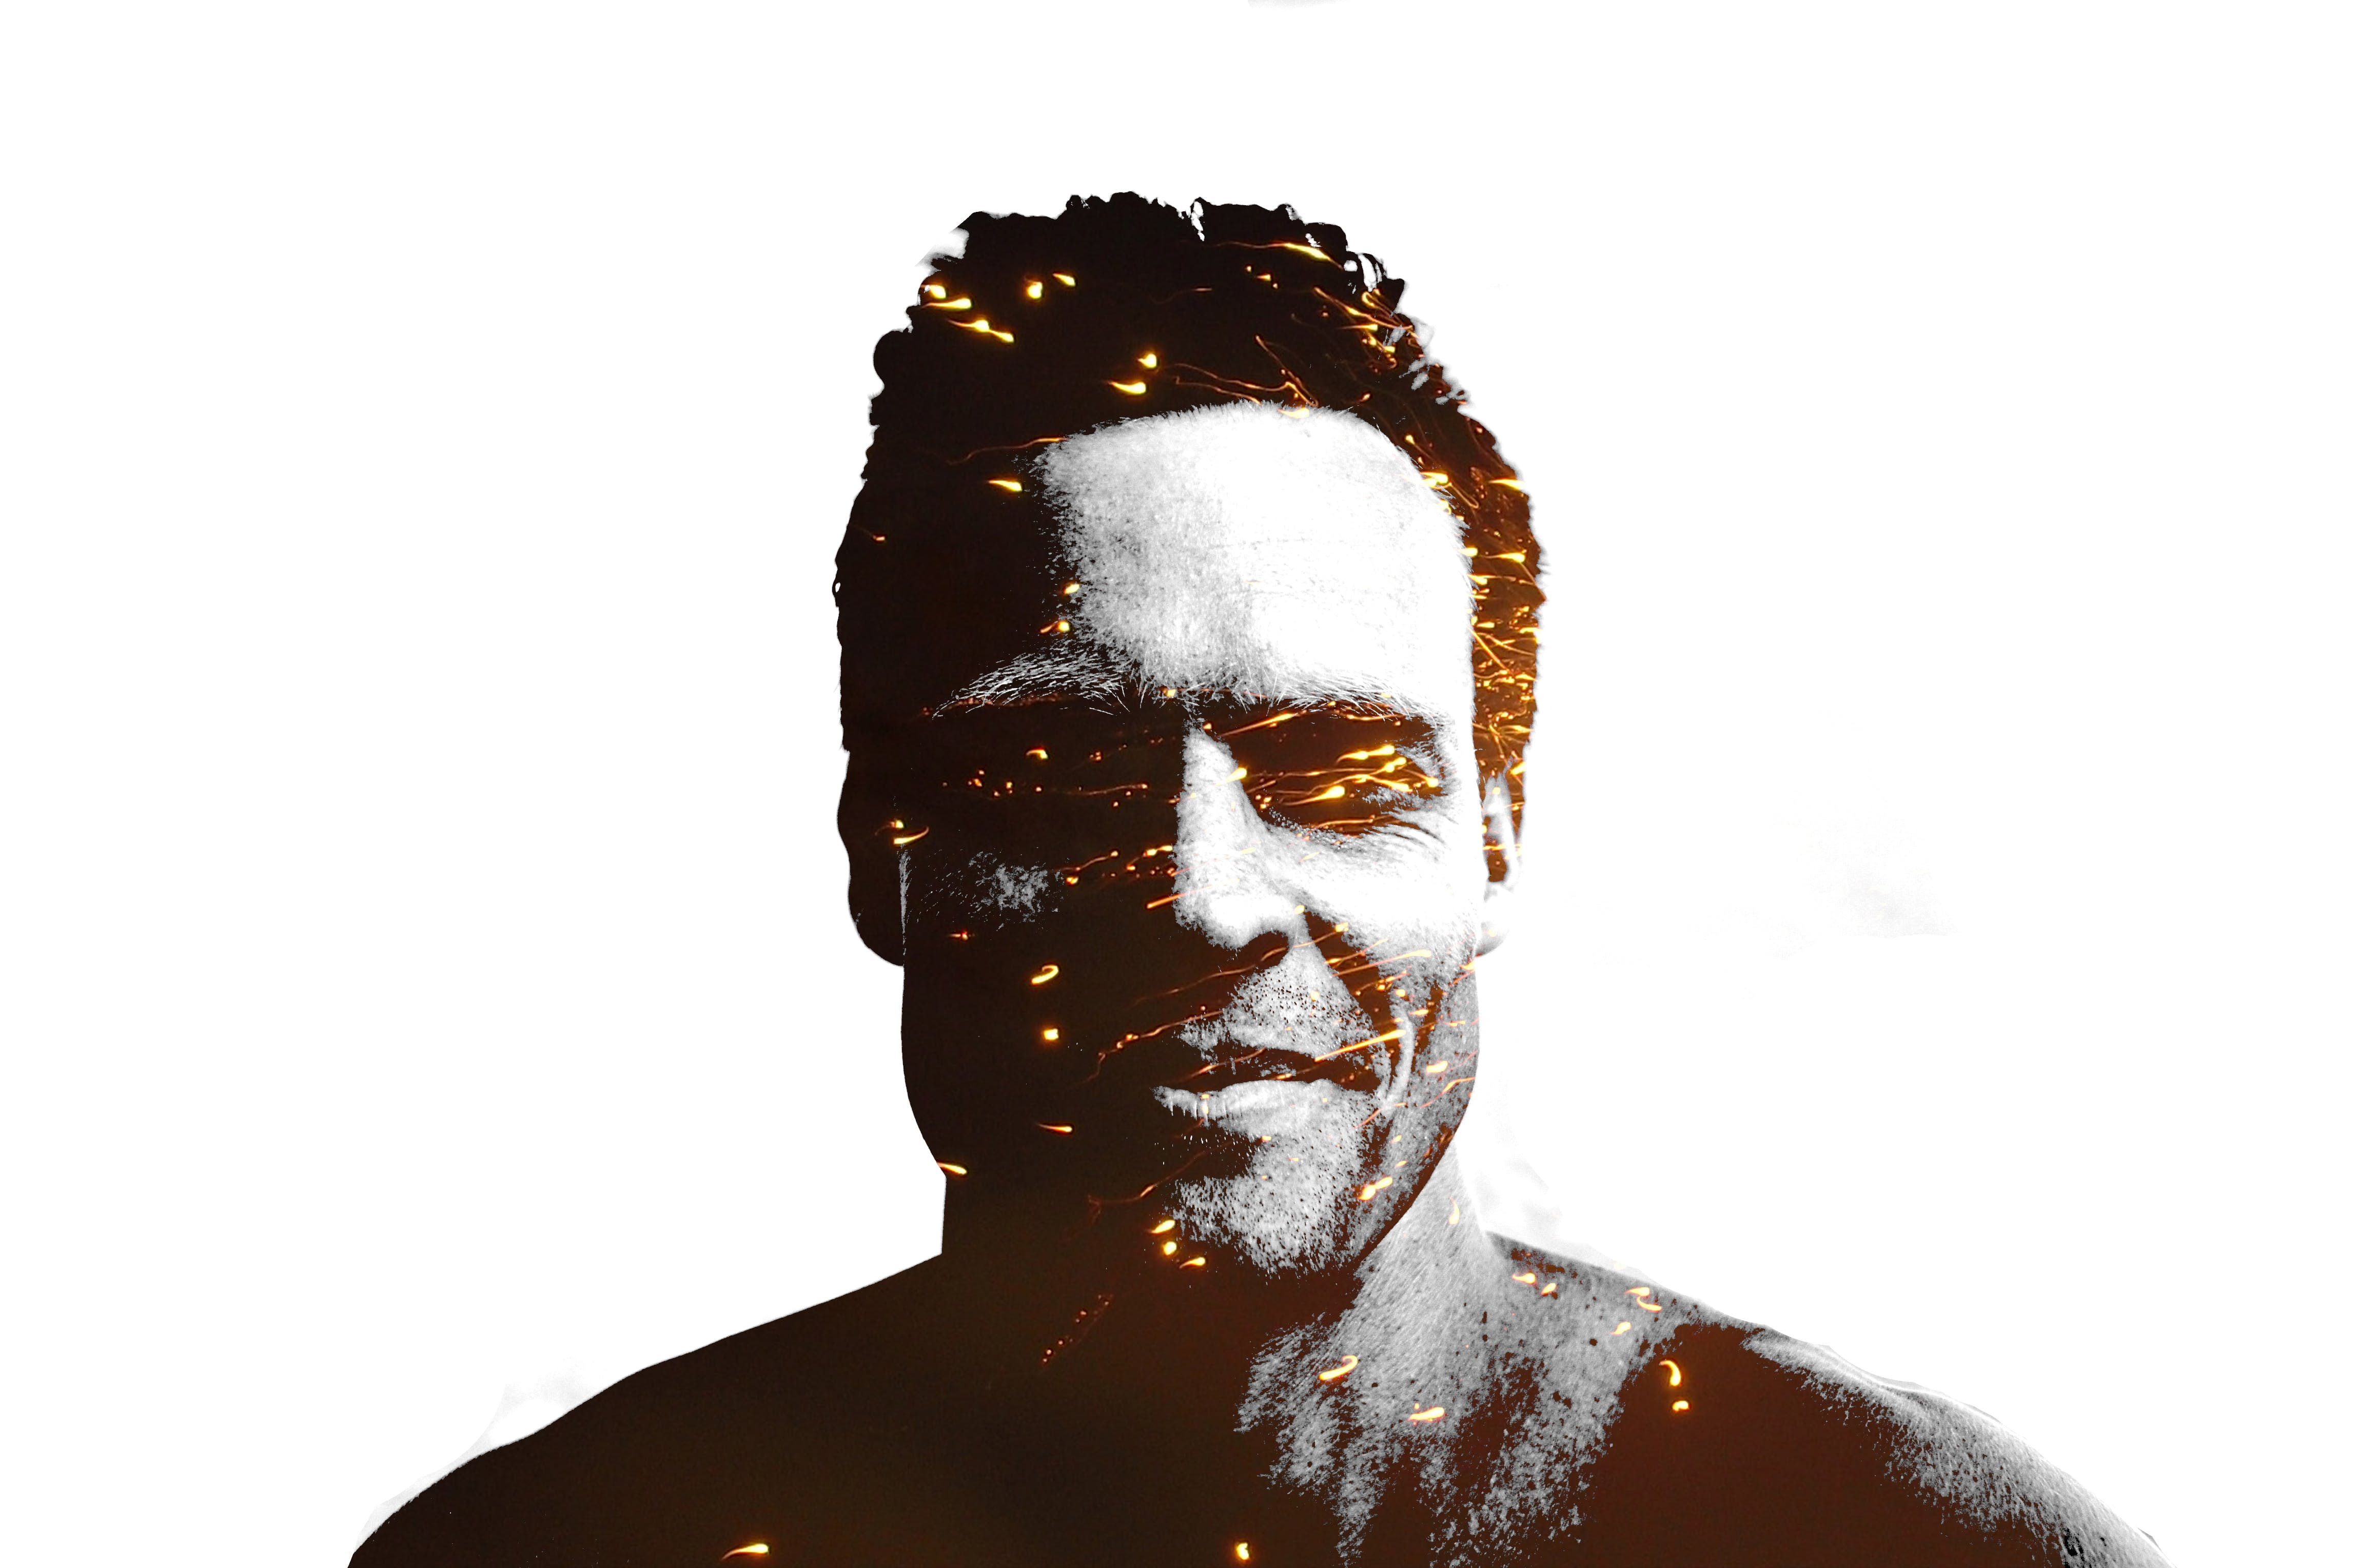 Free stock photo of man, happy, smiling, double exposure